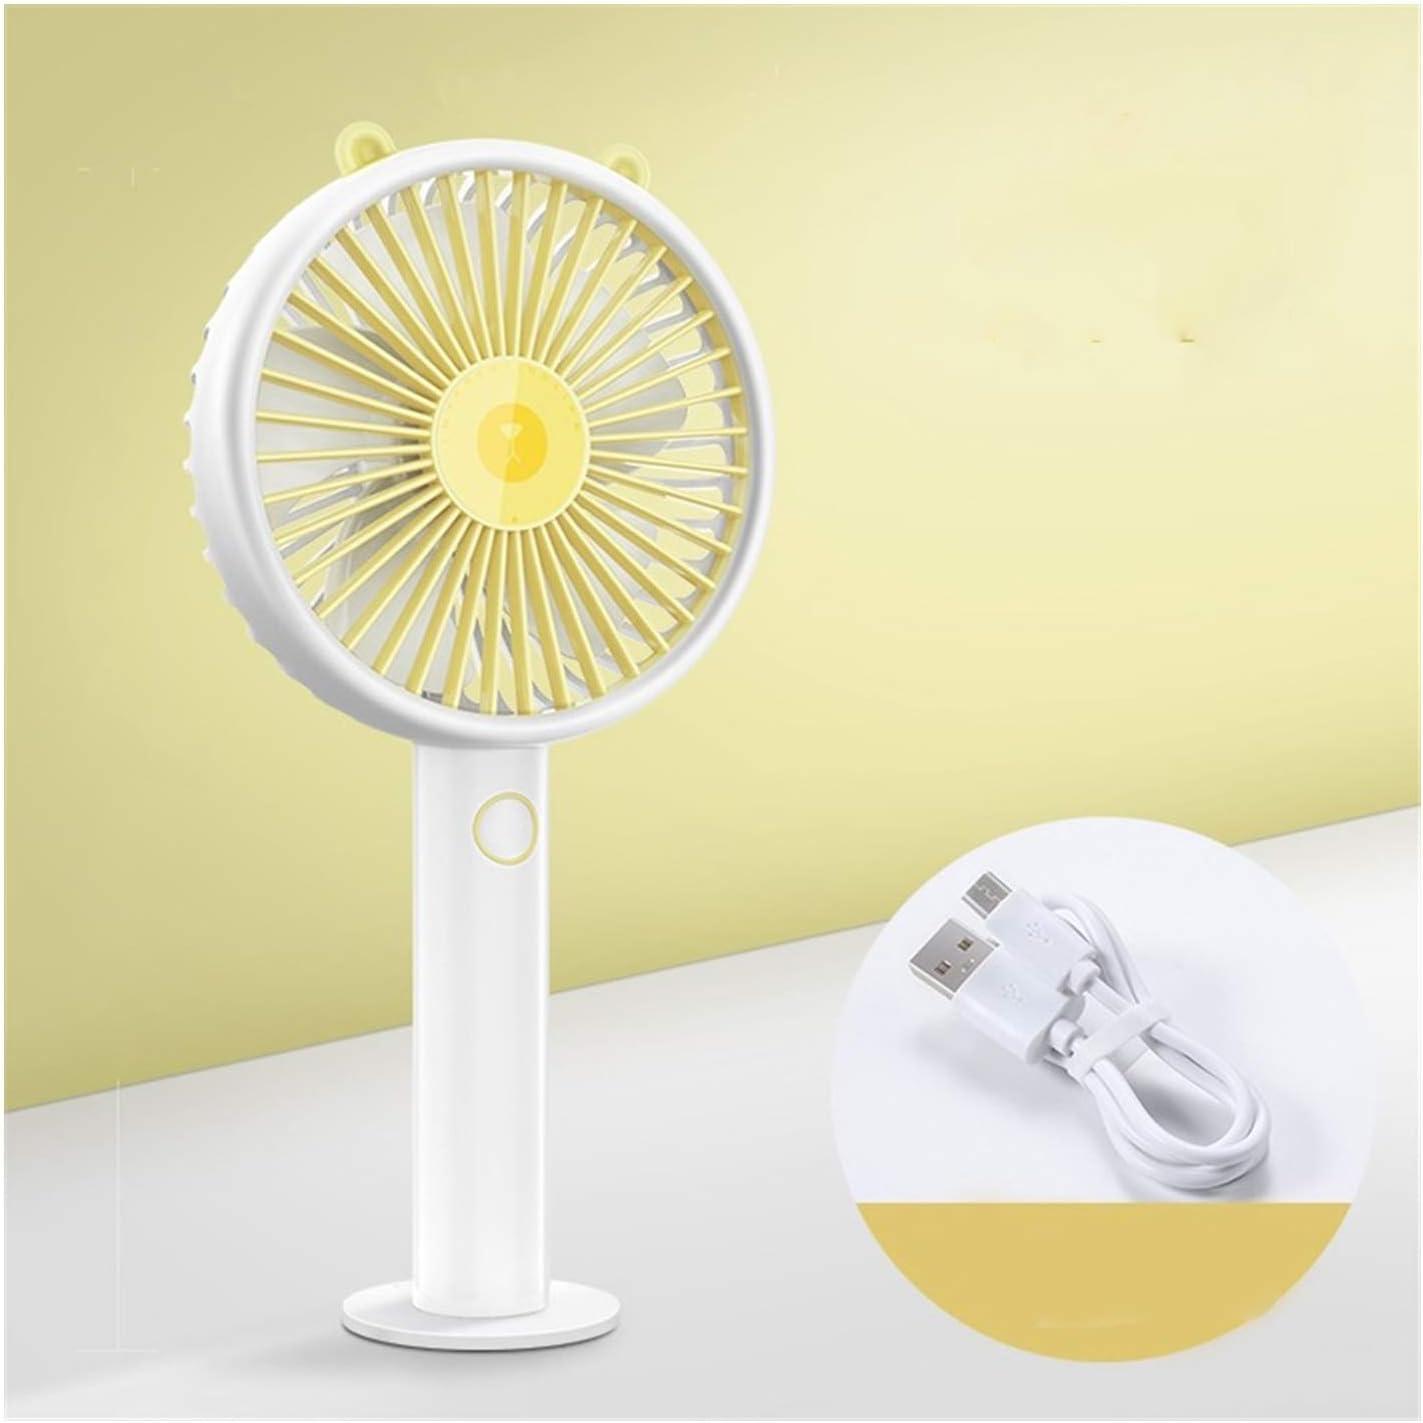 Wangqianli Mini Round Fan USB Handheld Electric 5 Don't 5 ☆ popular miss the campaign Desktop Le